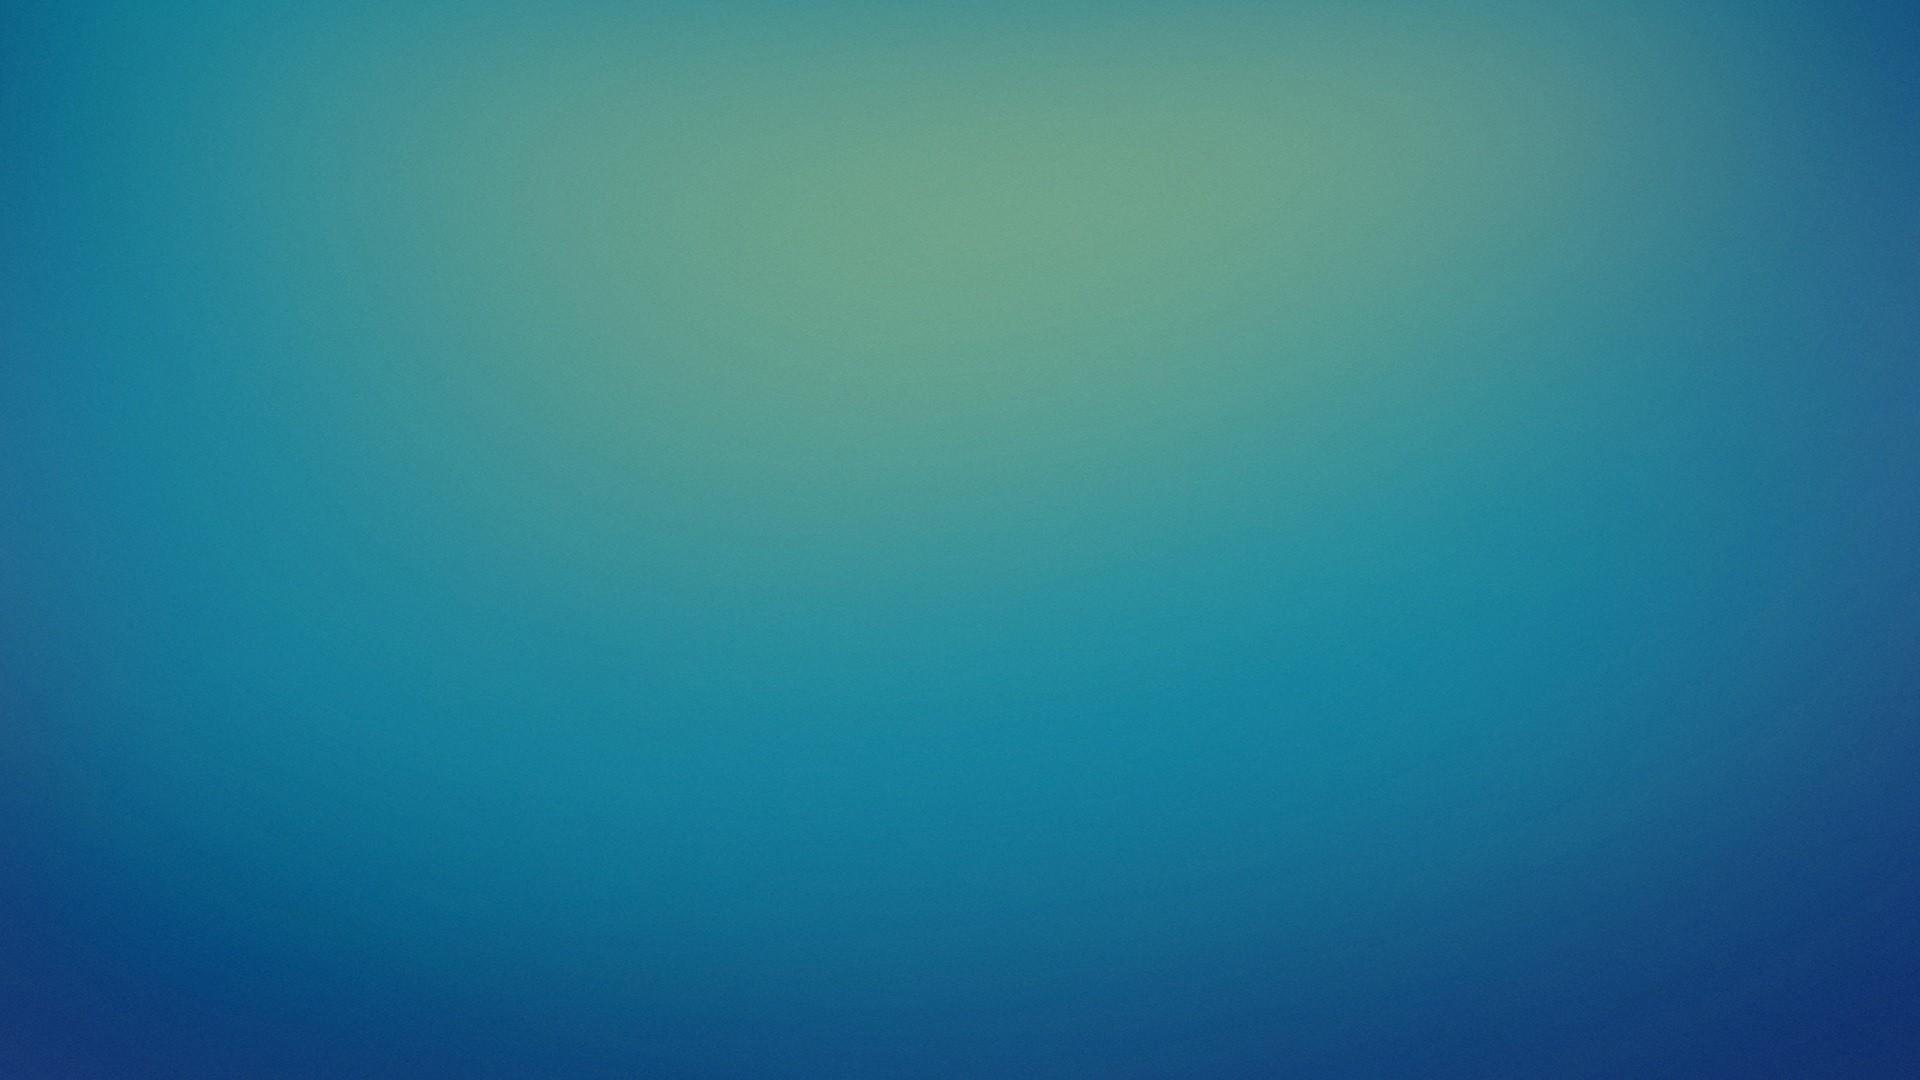 Translucent PC Wallpaper